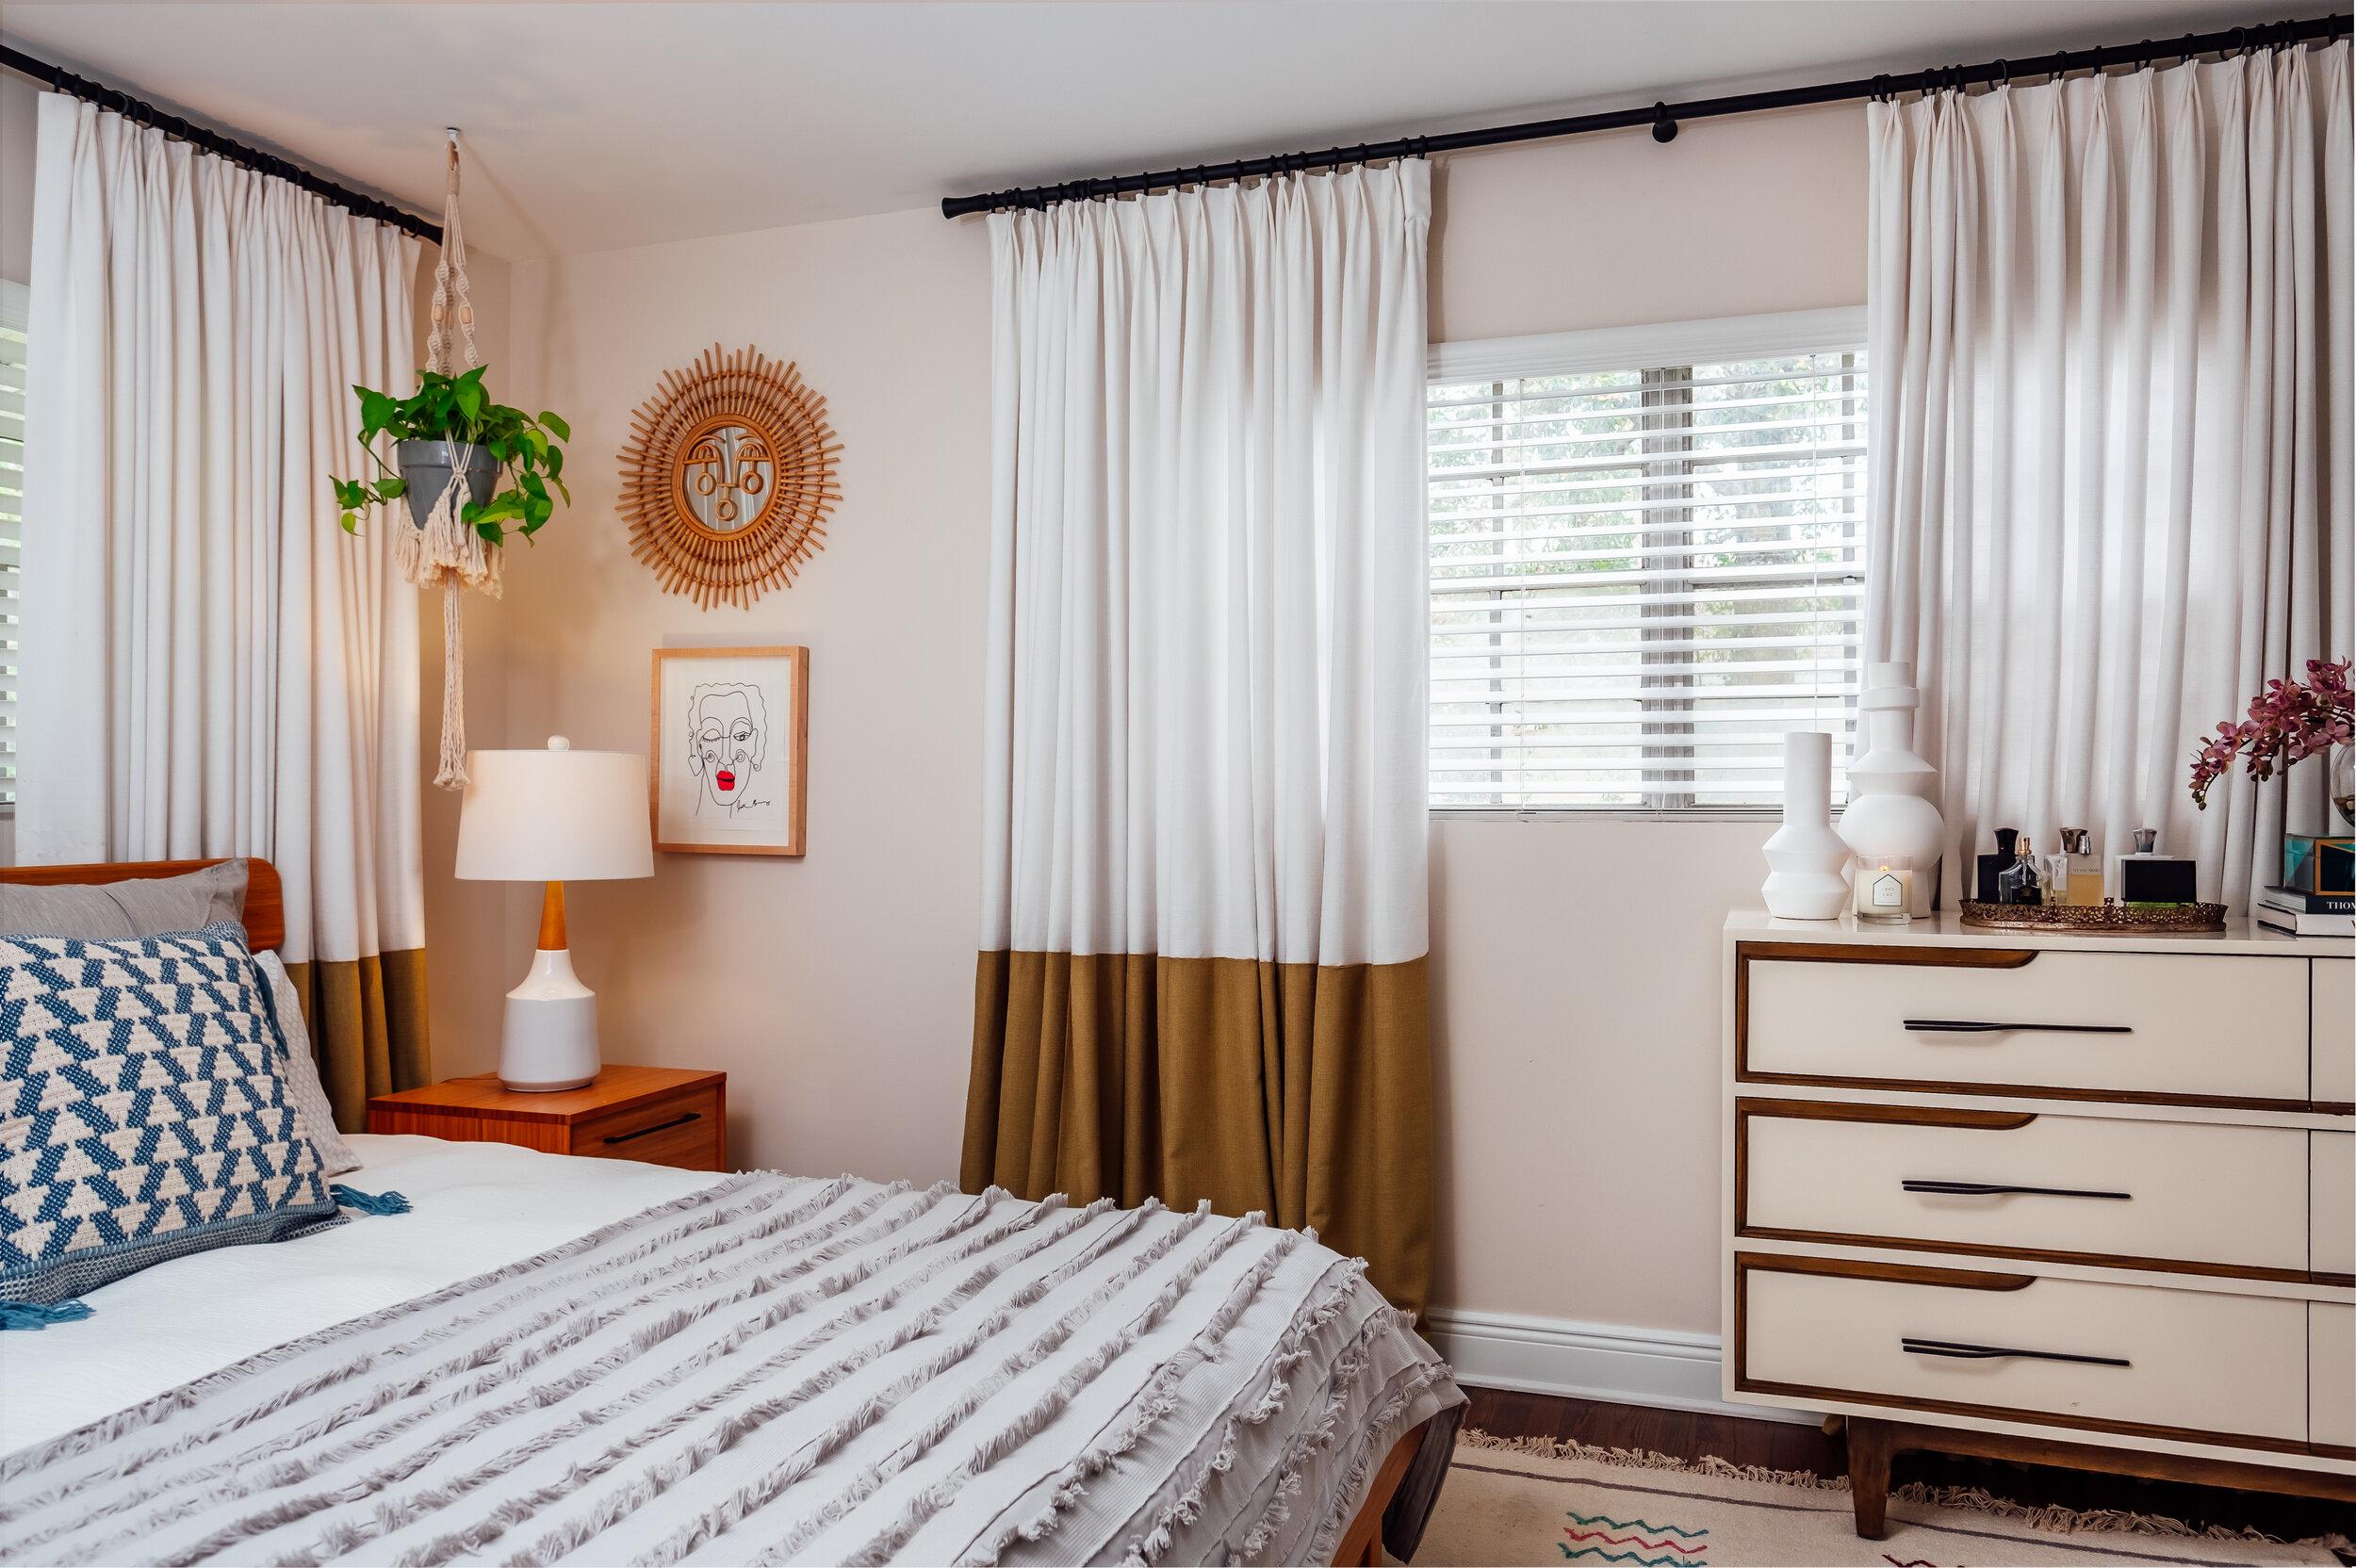 Annie S Home Style Our Modern Boho Master Bedroom Ann Cox Design Interior Design In Tampa